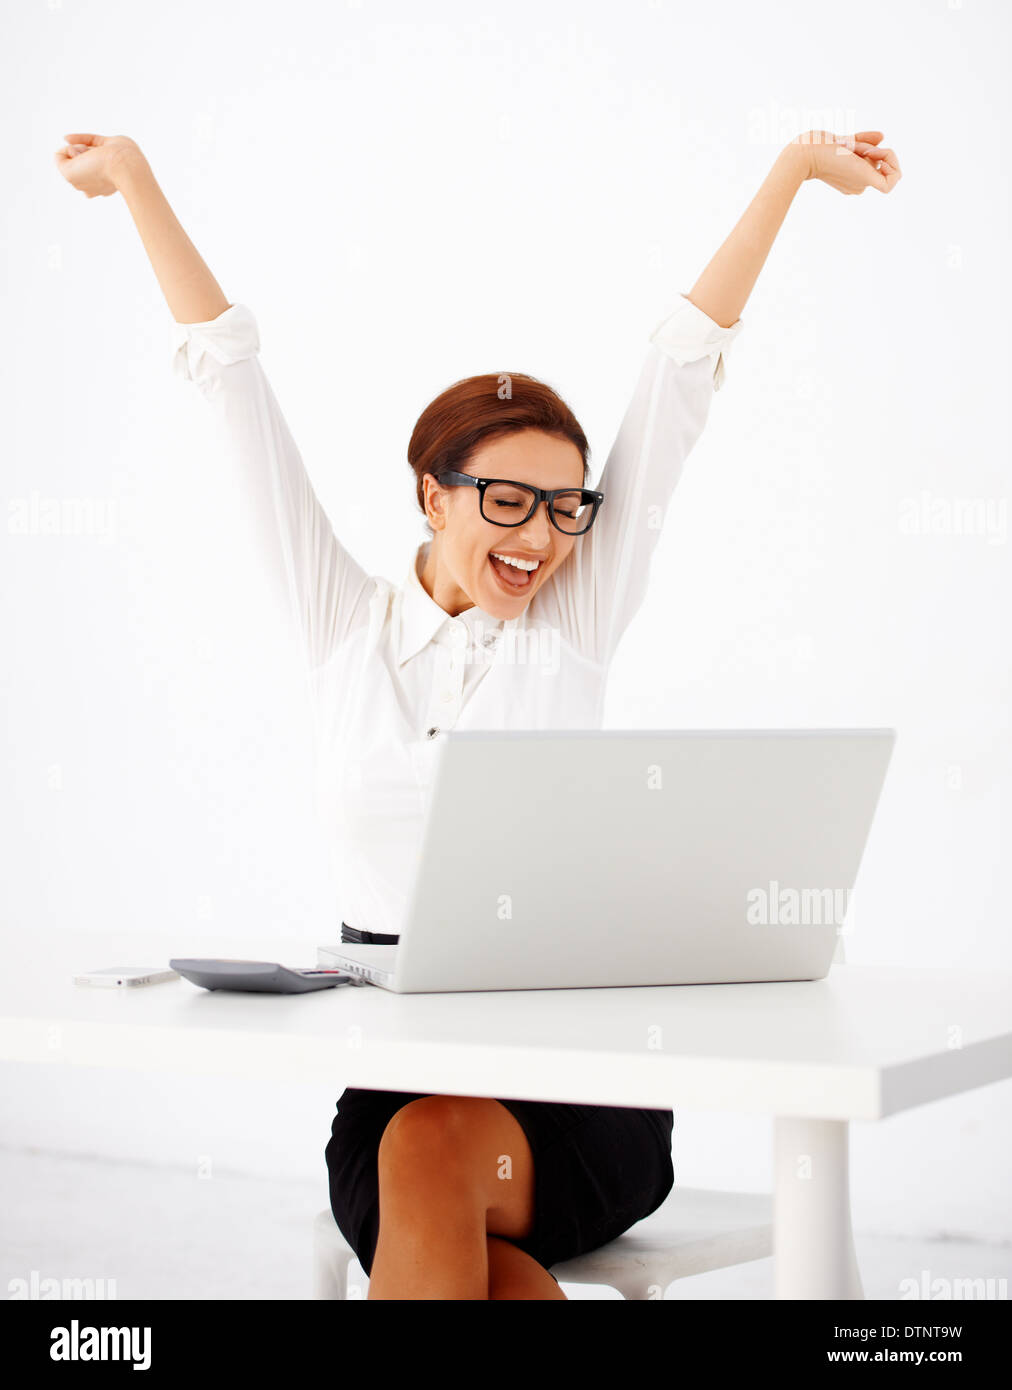 Businesswoman rejoicing - Stock Image